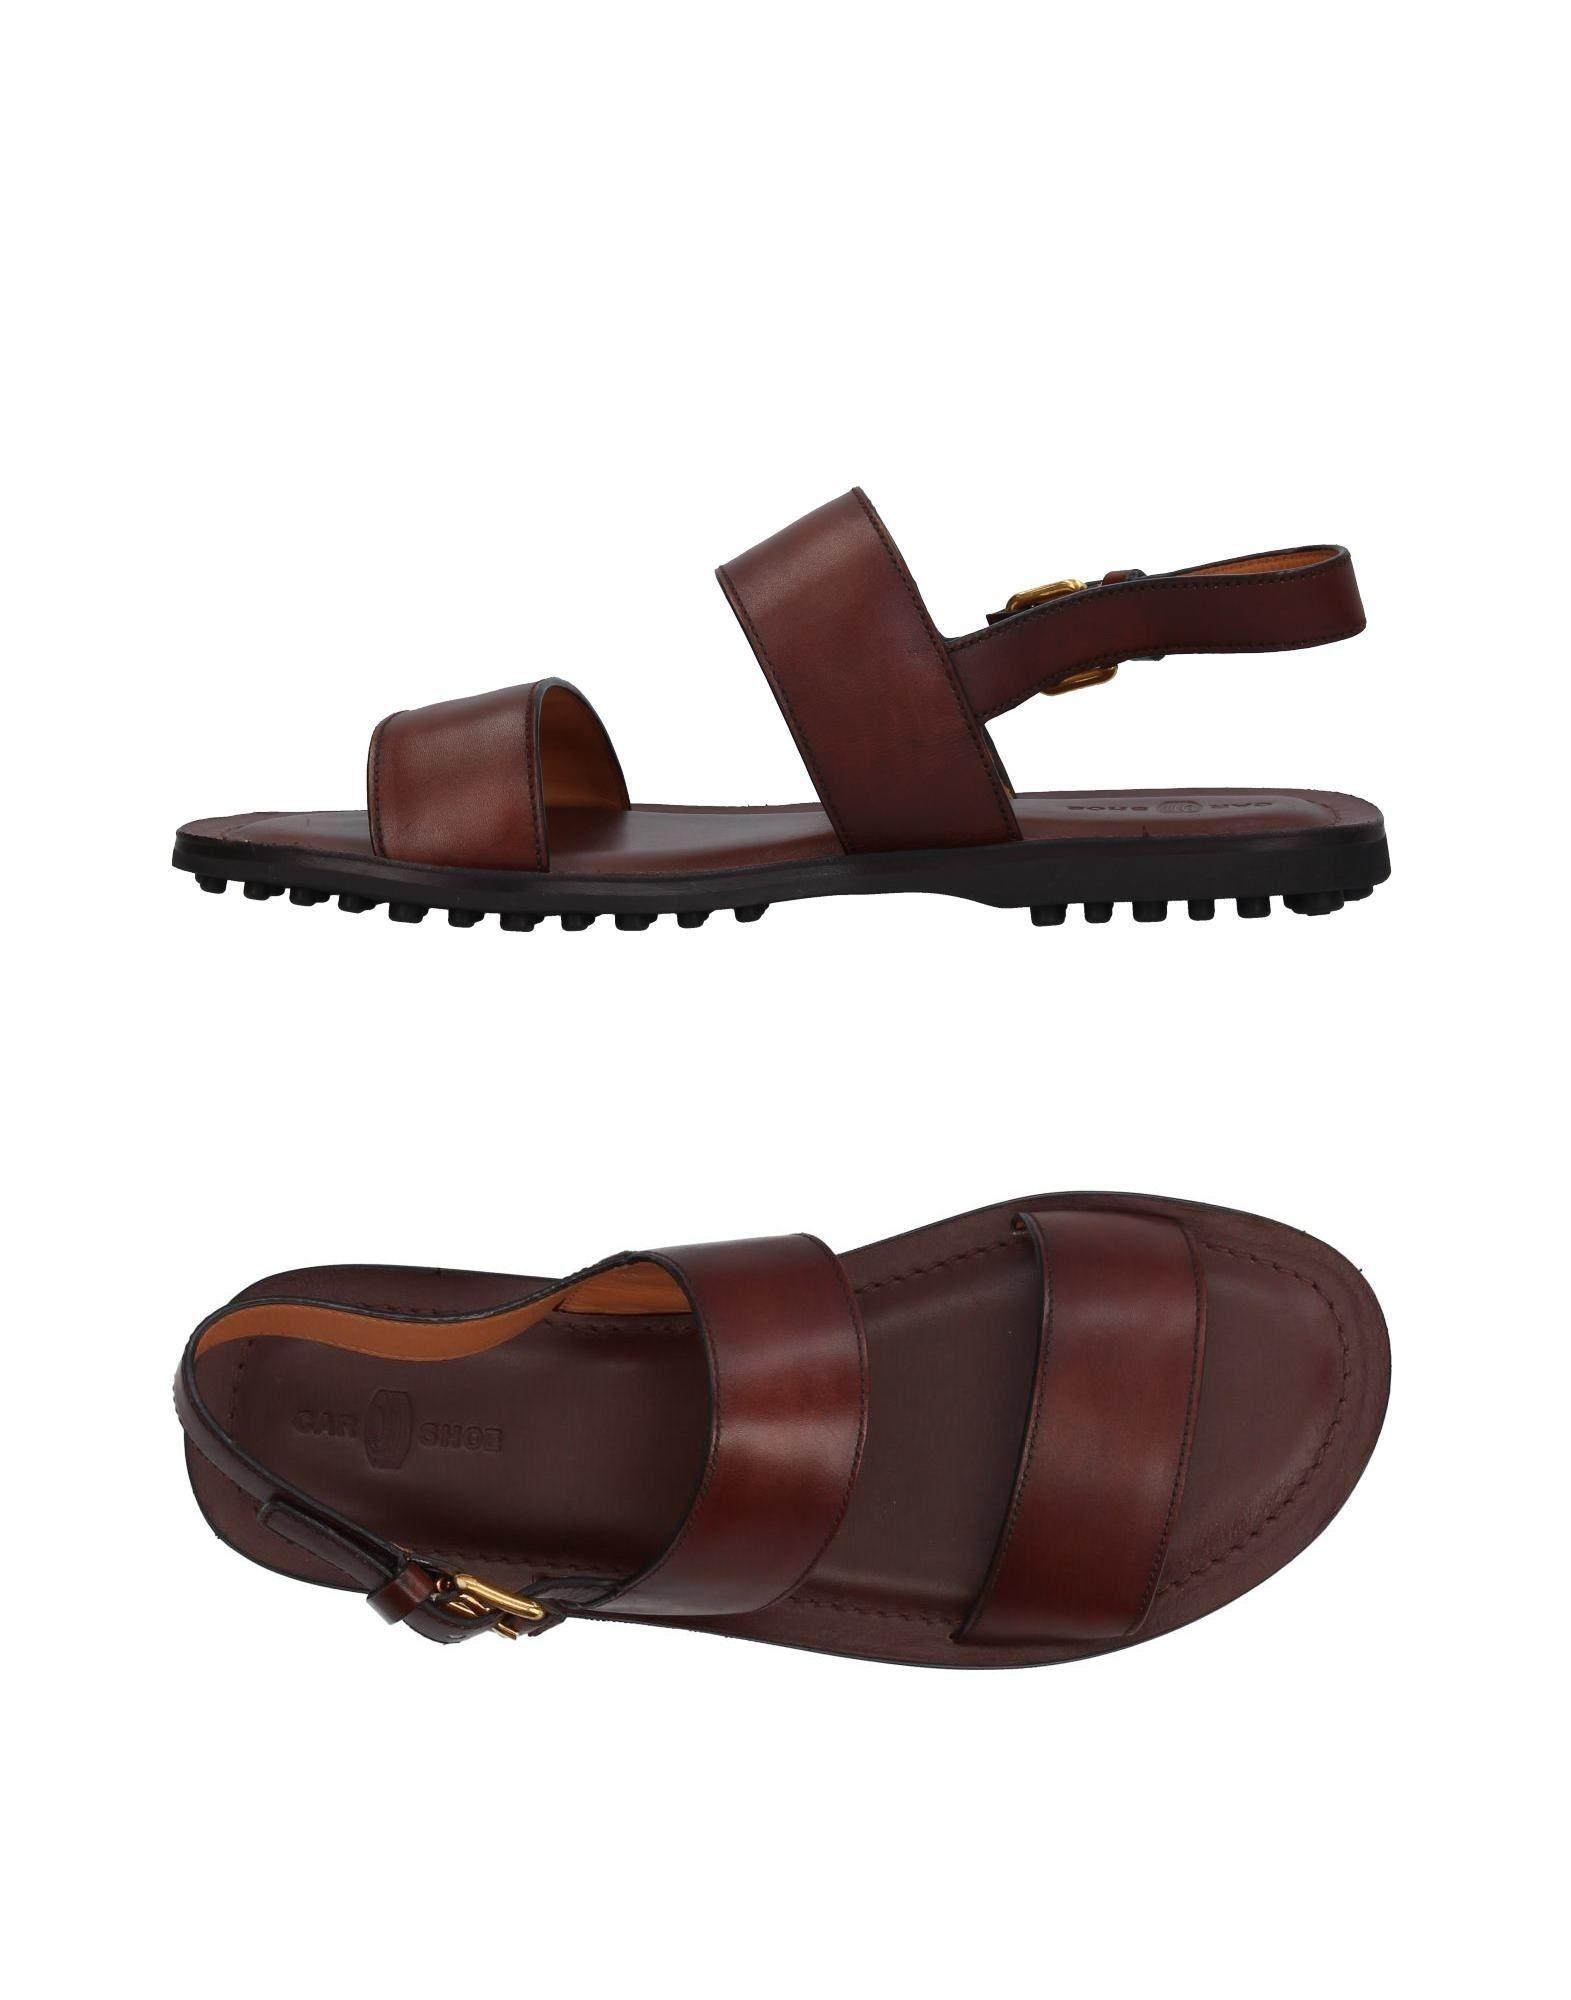 Moda Sandali Carshoe Uomo - 11374993QT